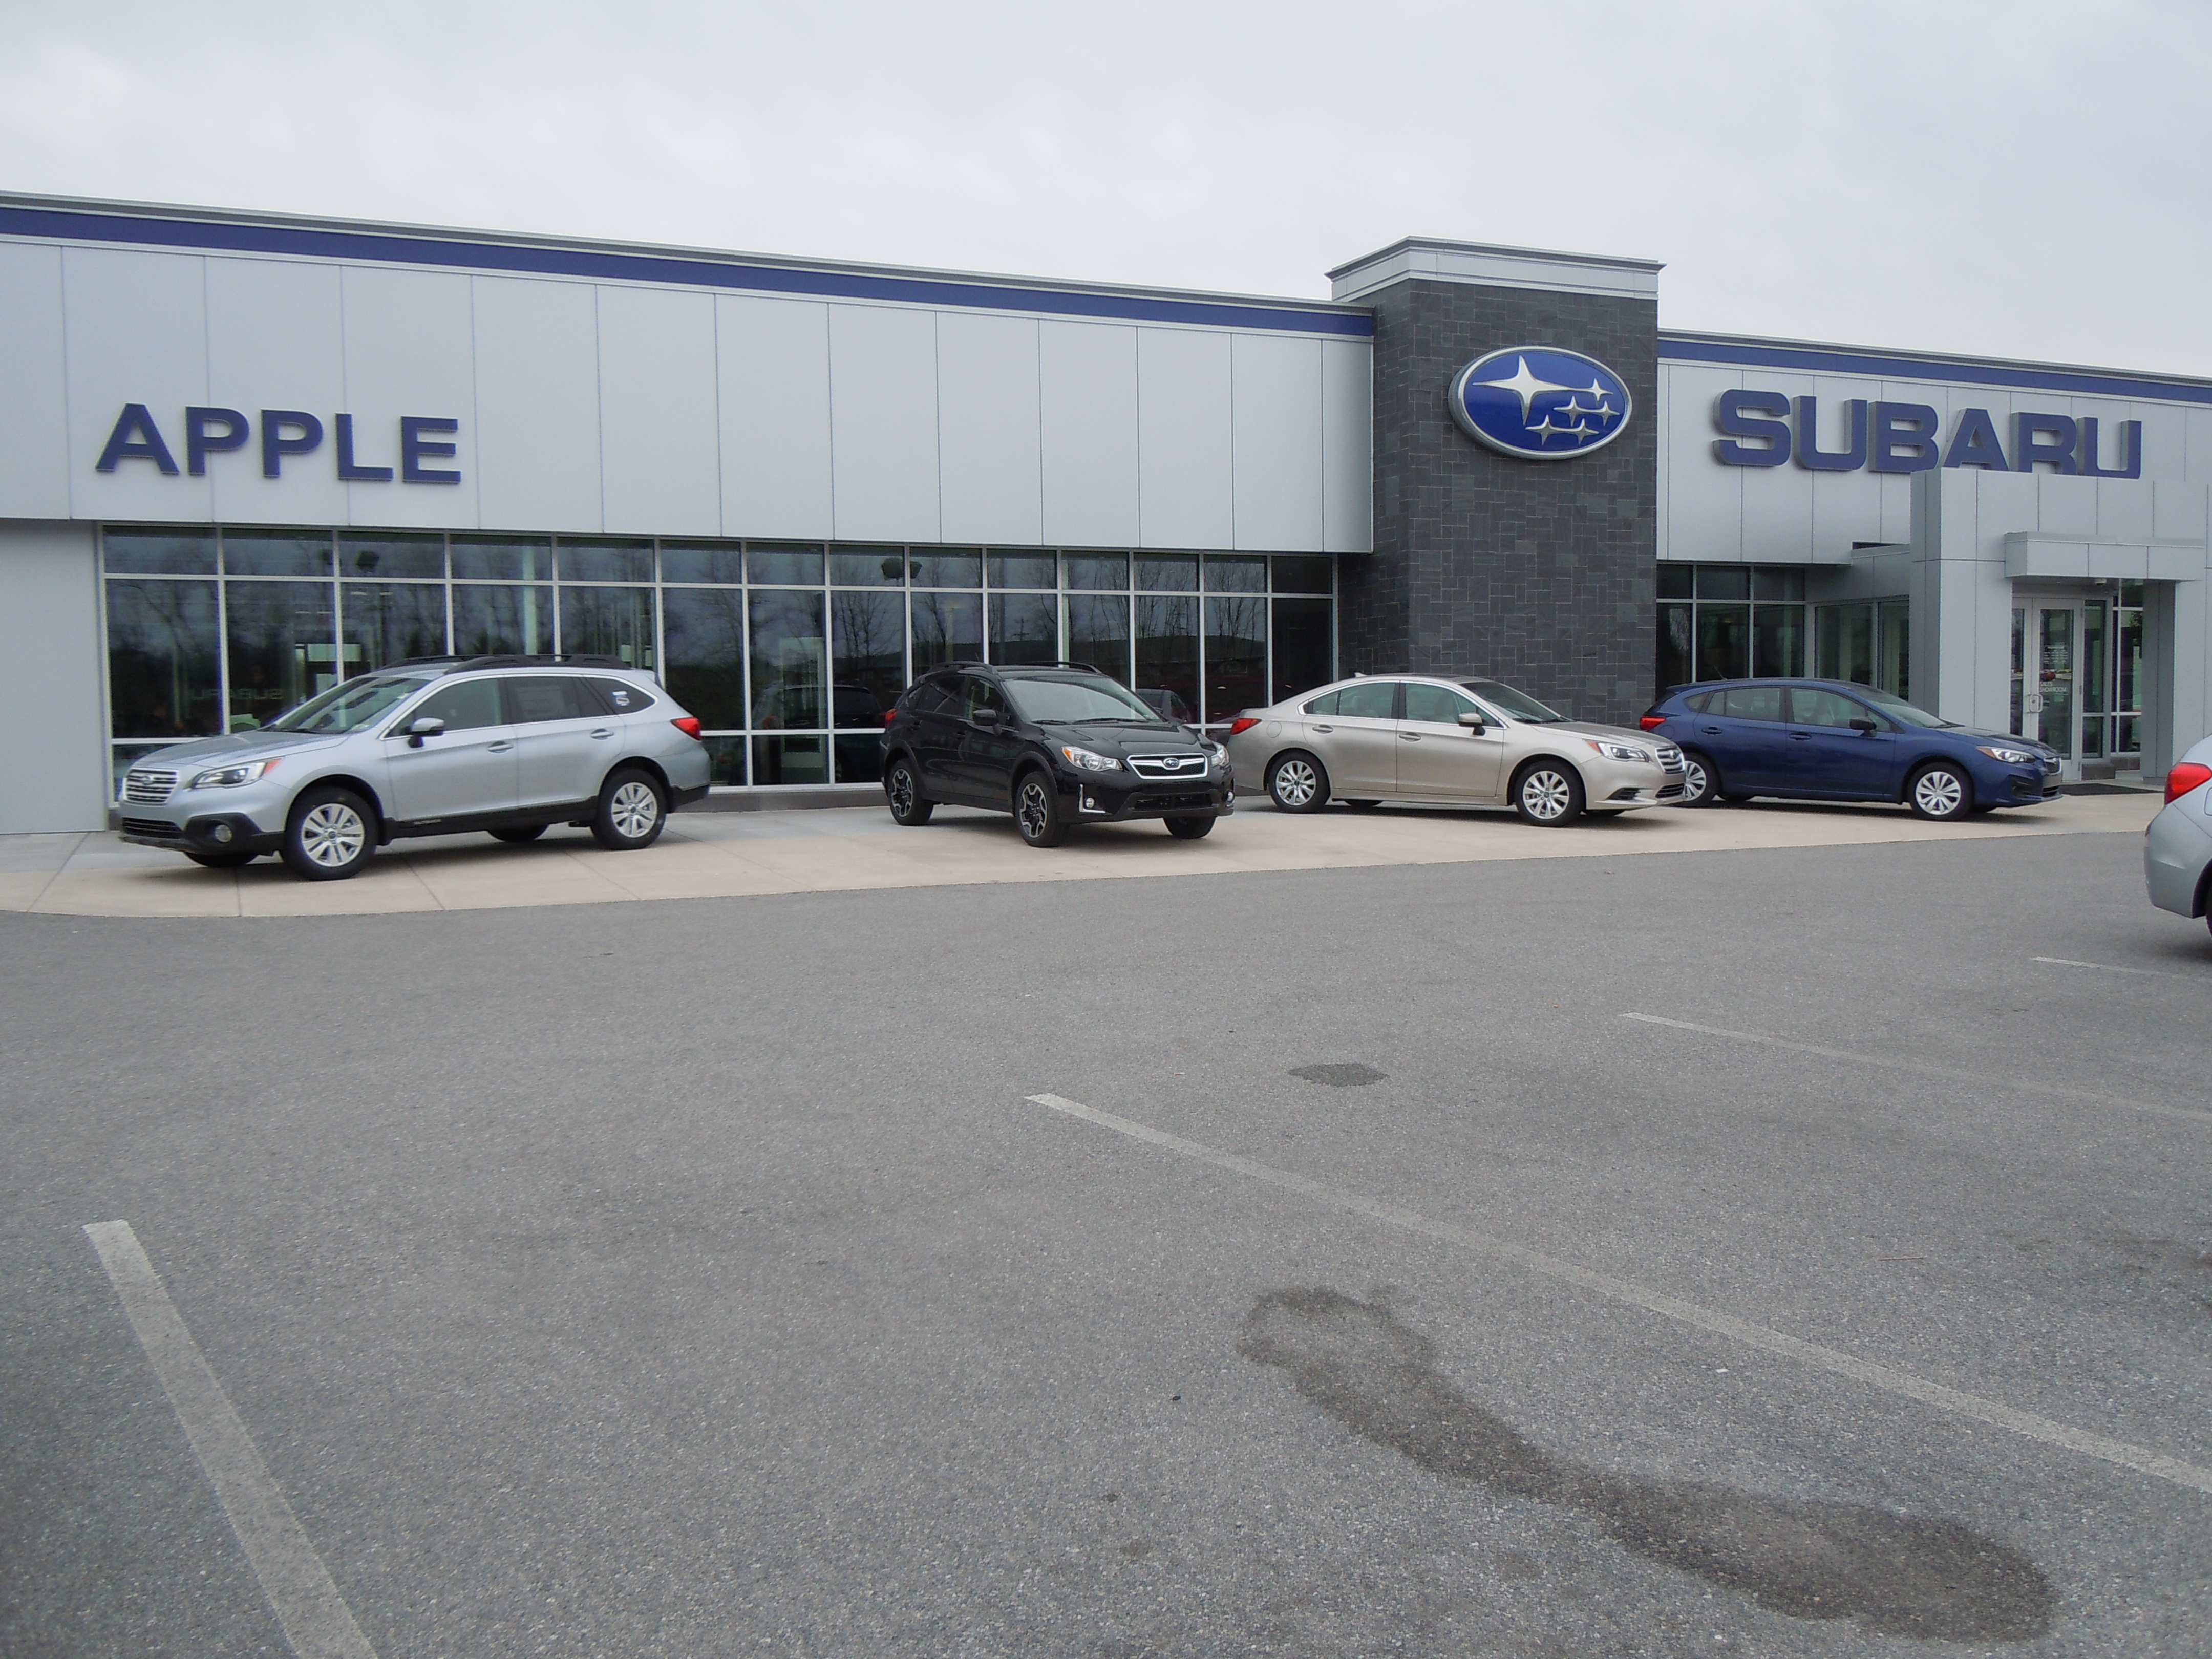 Apple Nissan York Pa Used Cars